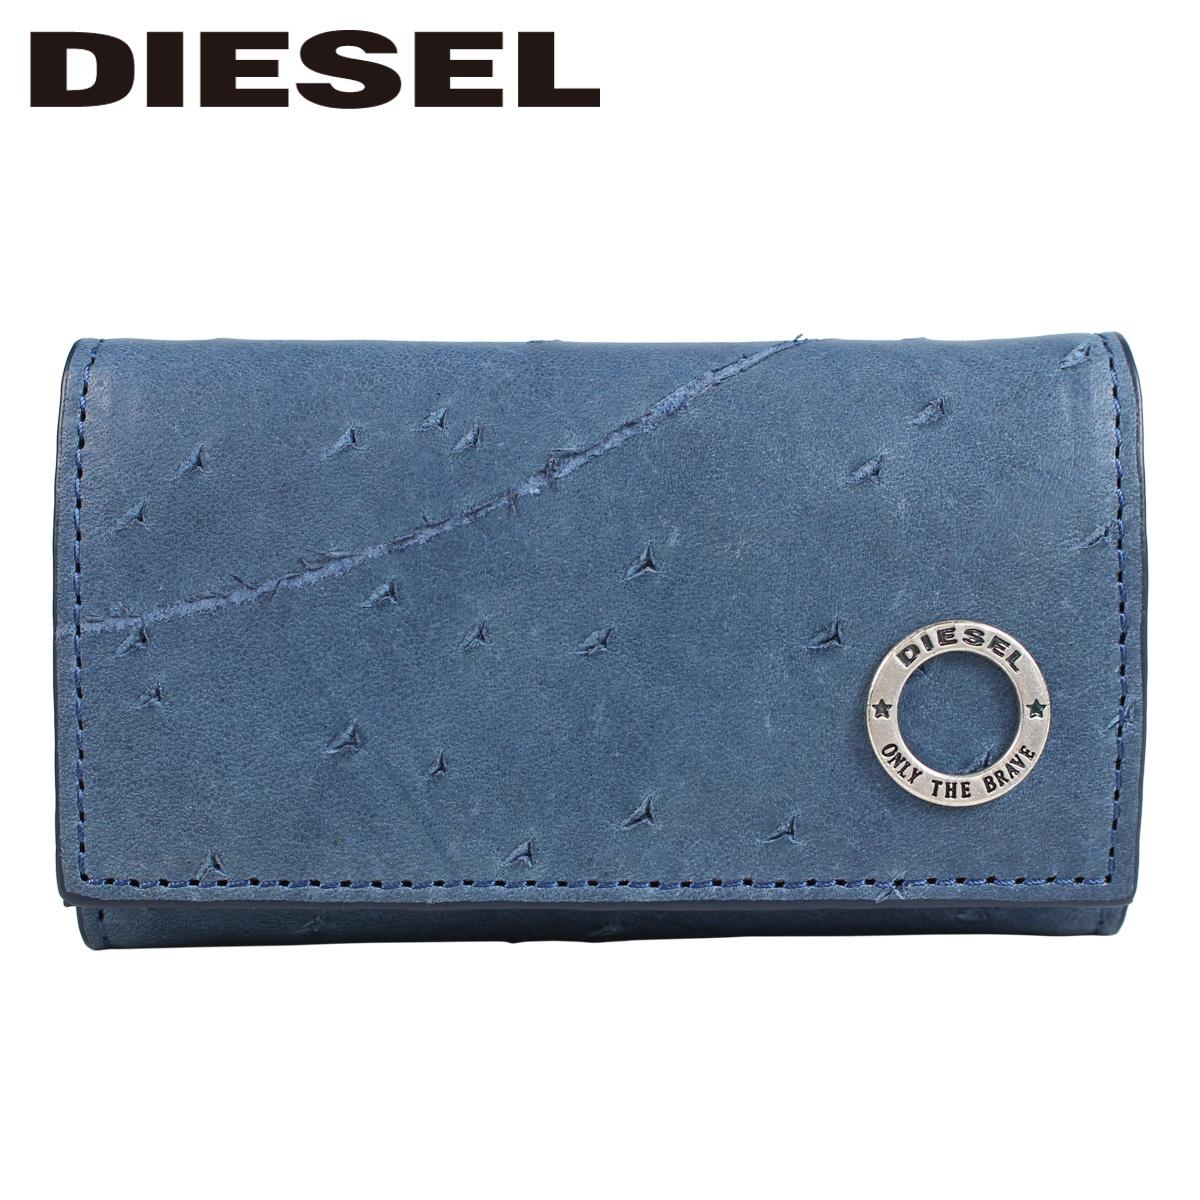 DIESEL KURACAO 24 ZIP ディーゼル キーケース メンズ 本革 6連 ブルー X05825 PR080